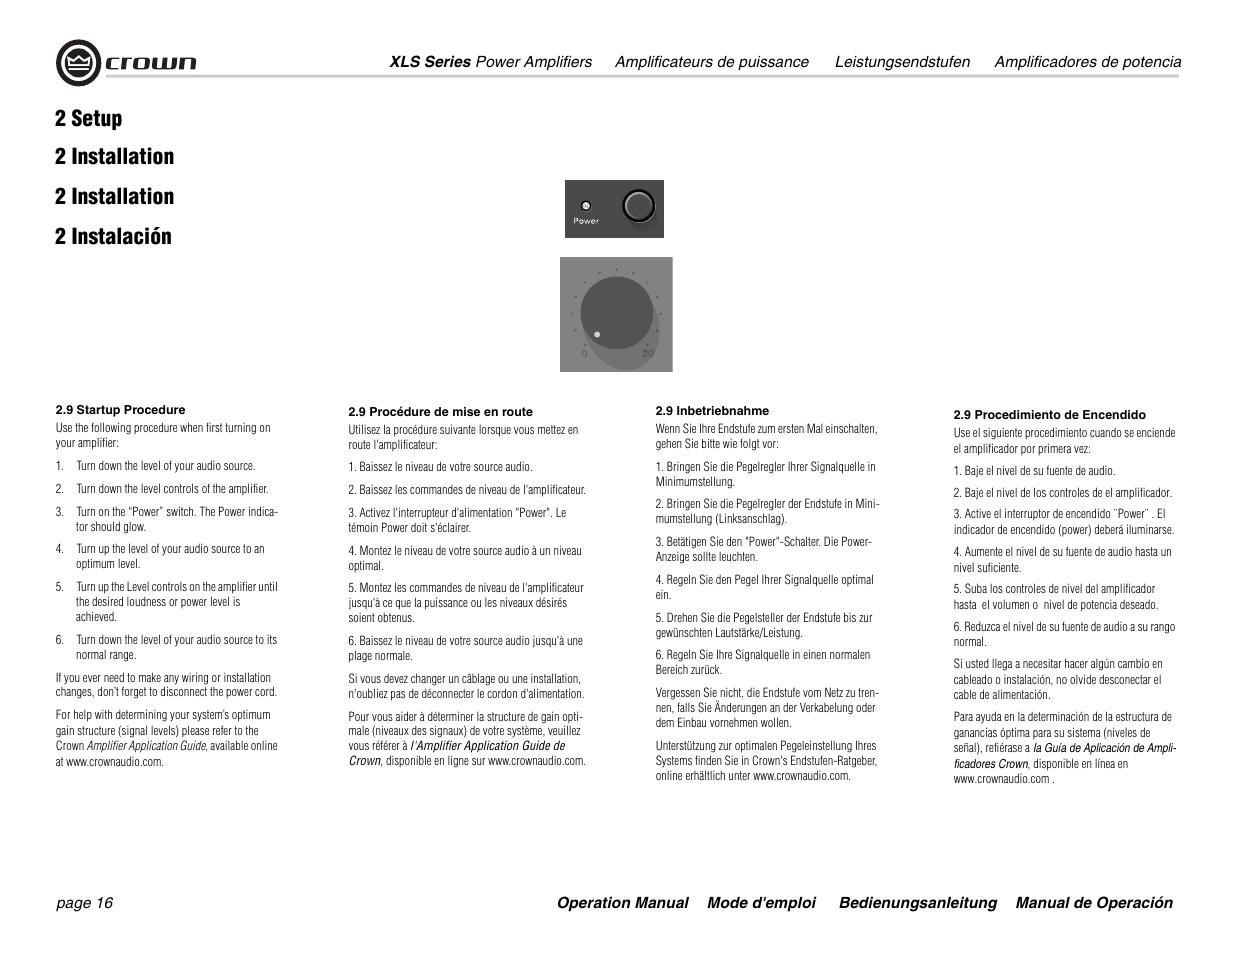 crown equipment xls 602 user manual page 16 36 original mode rh manualsdir com User Training Clip Art User Guide